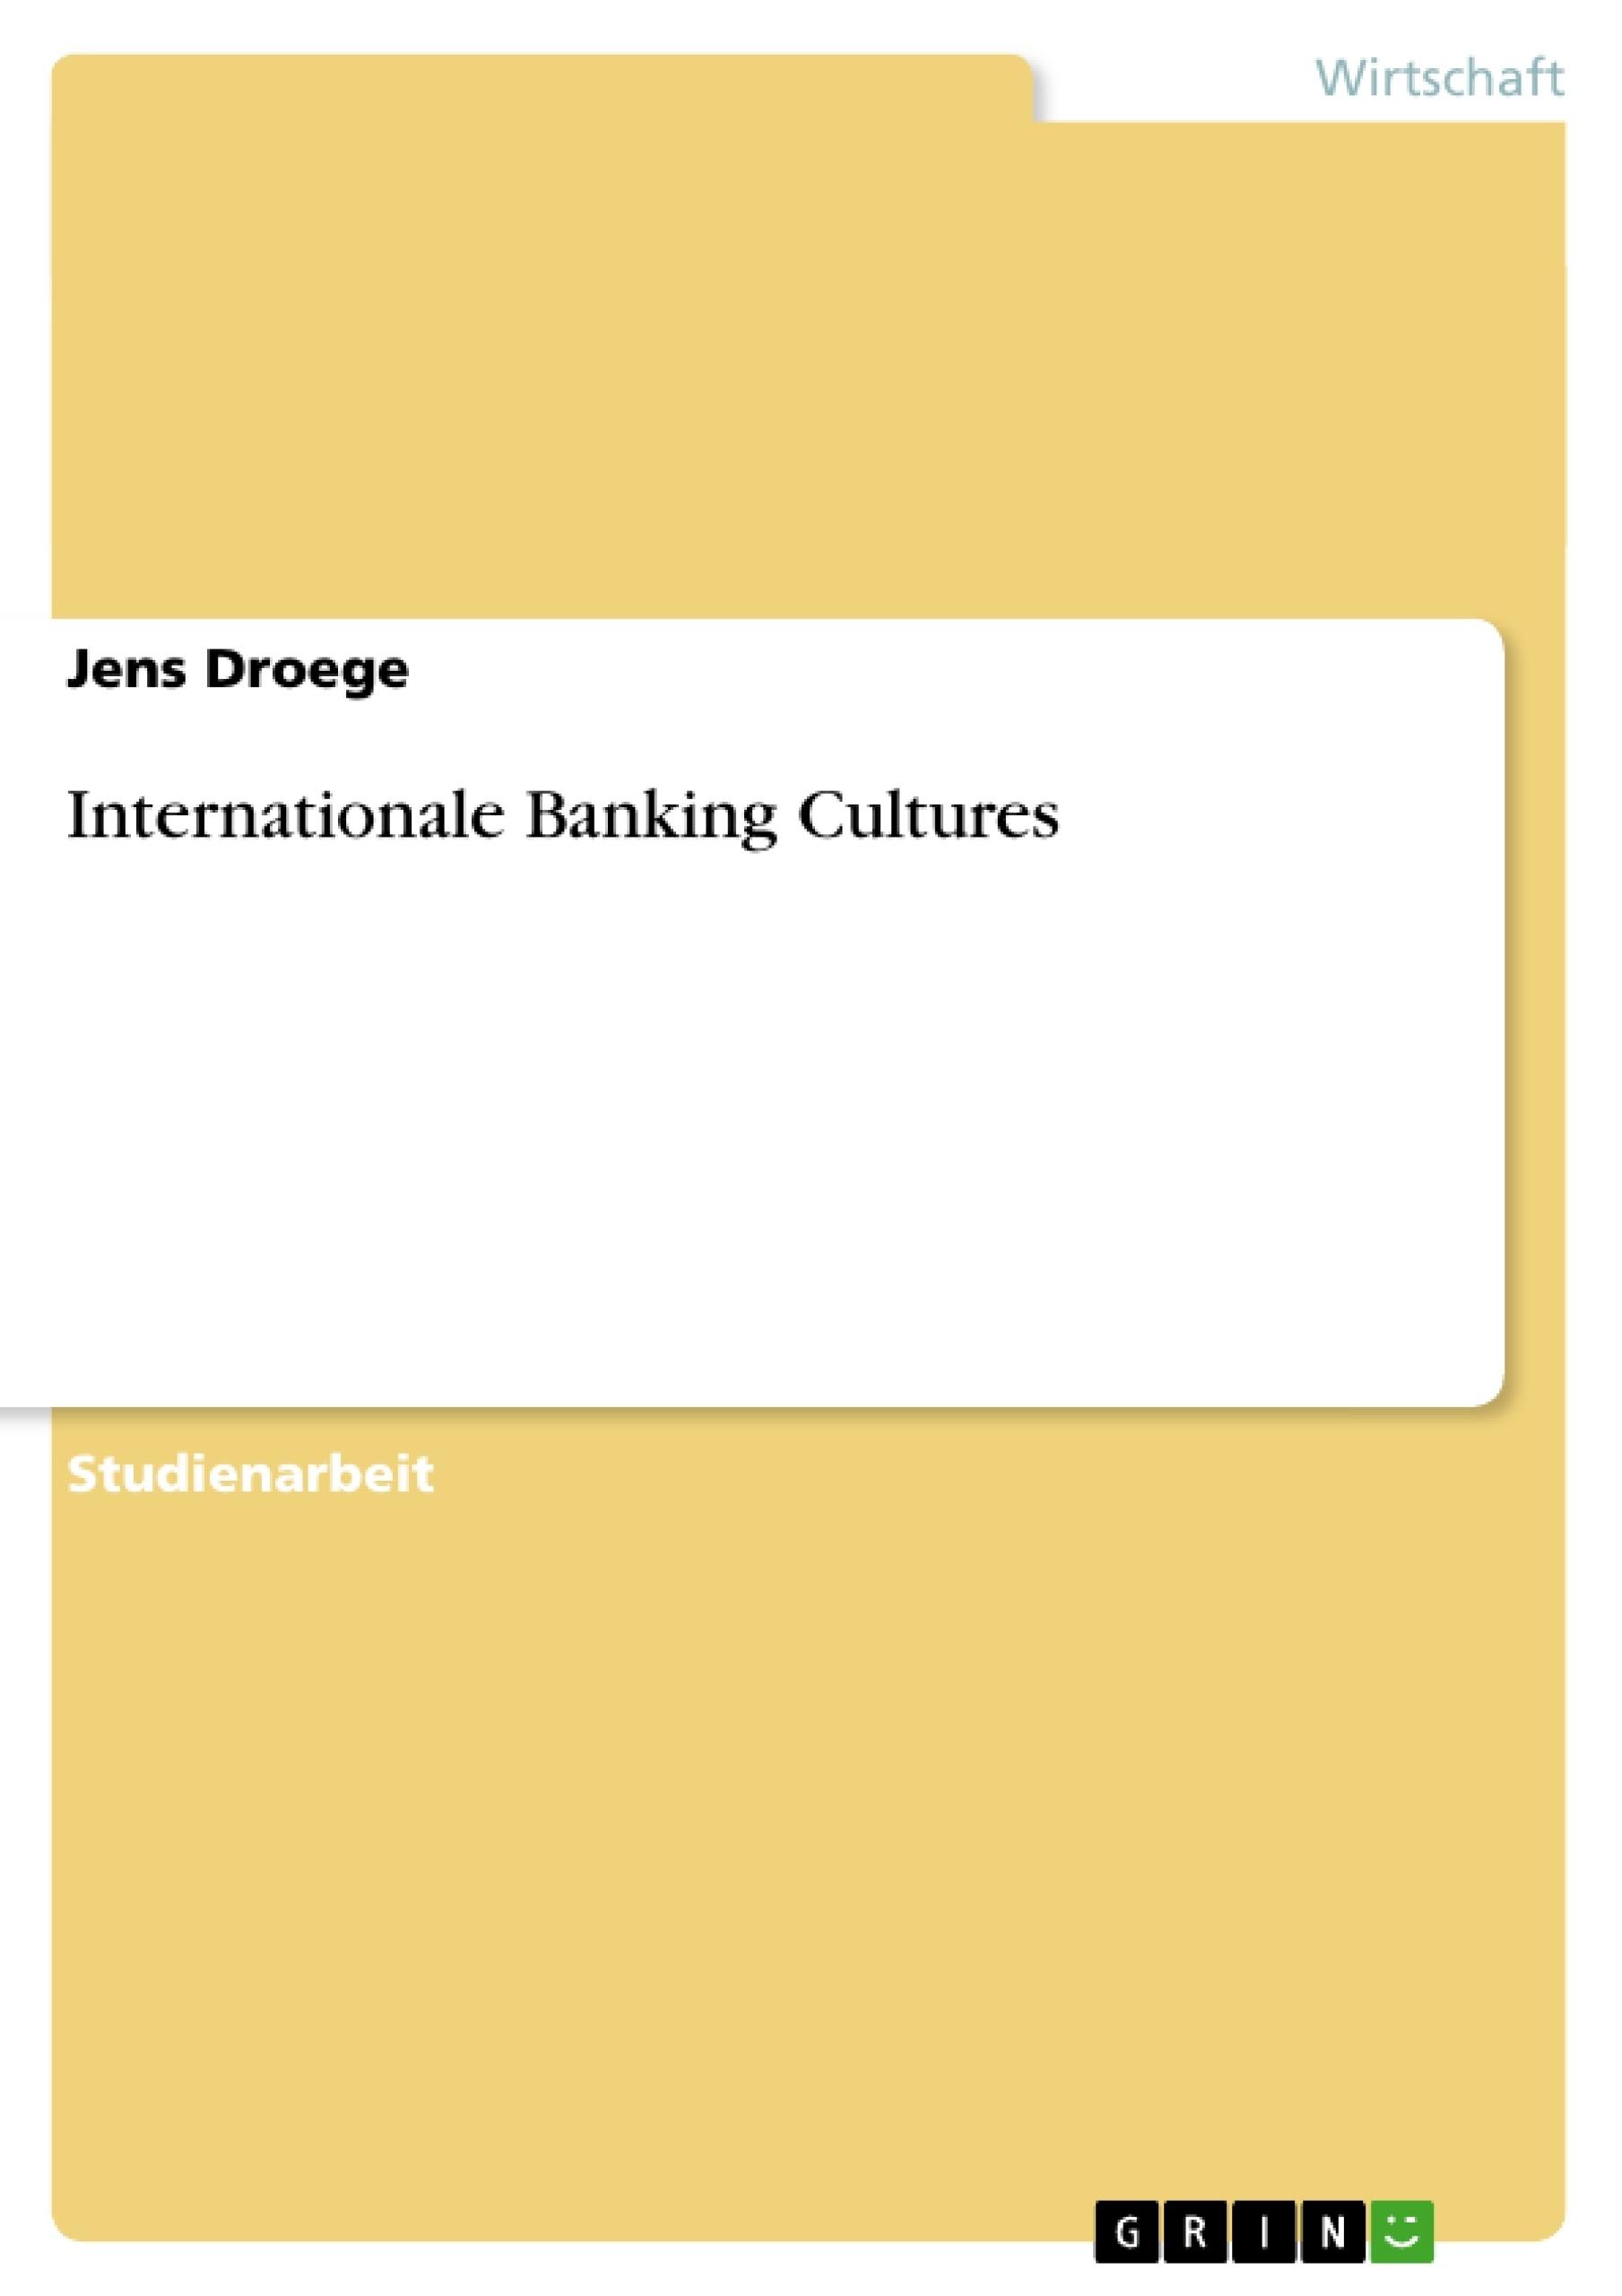 Titel: Internationale Banking Cultures